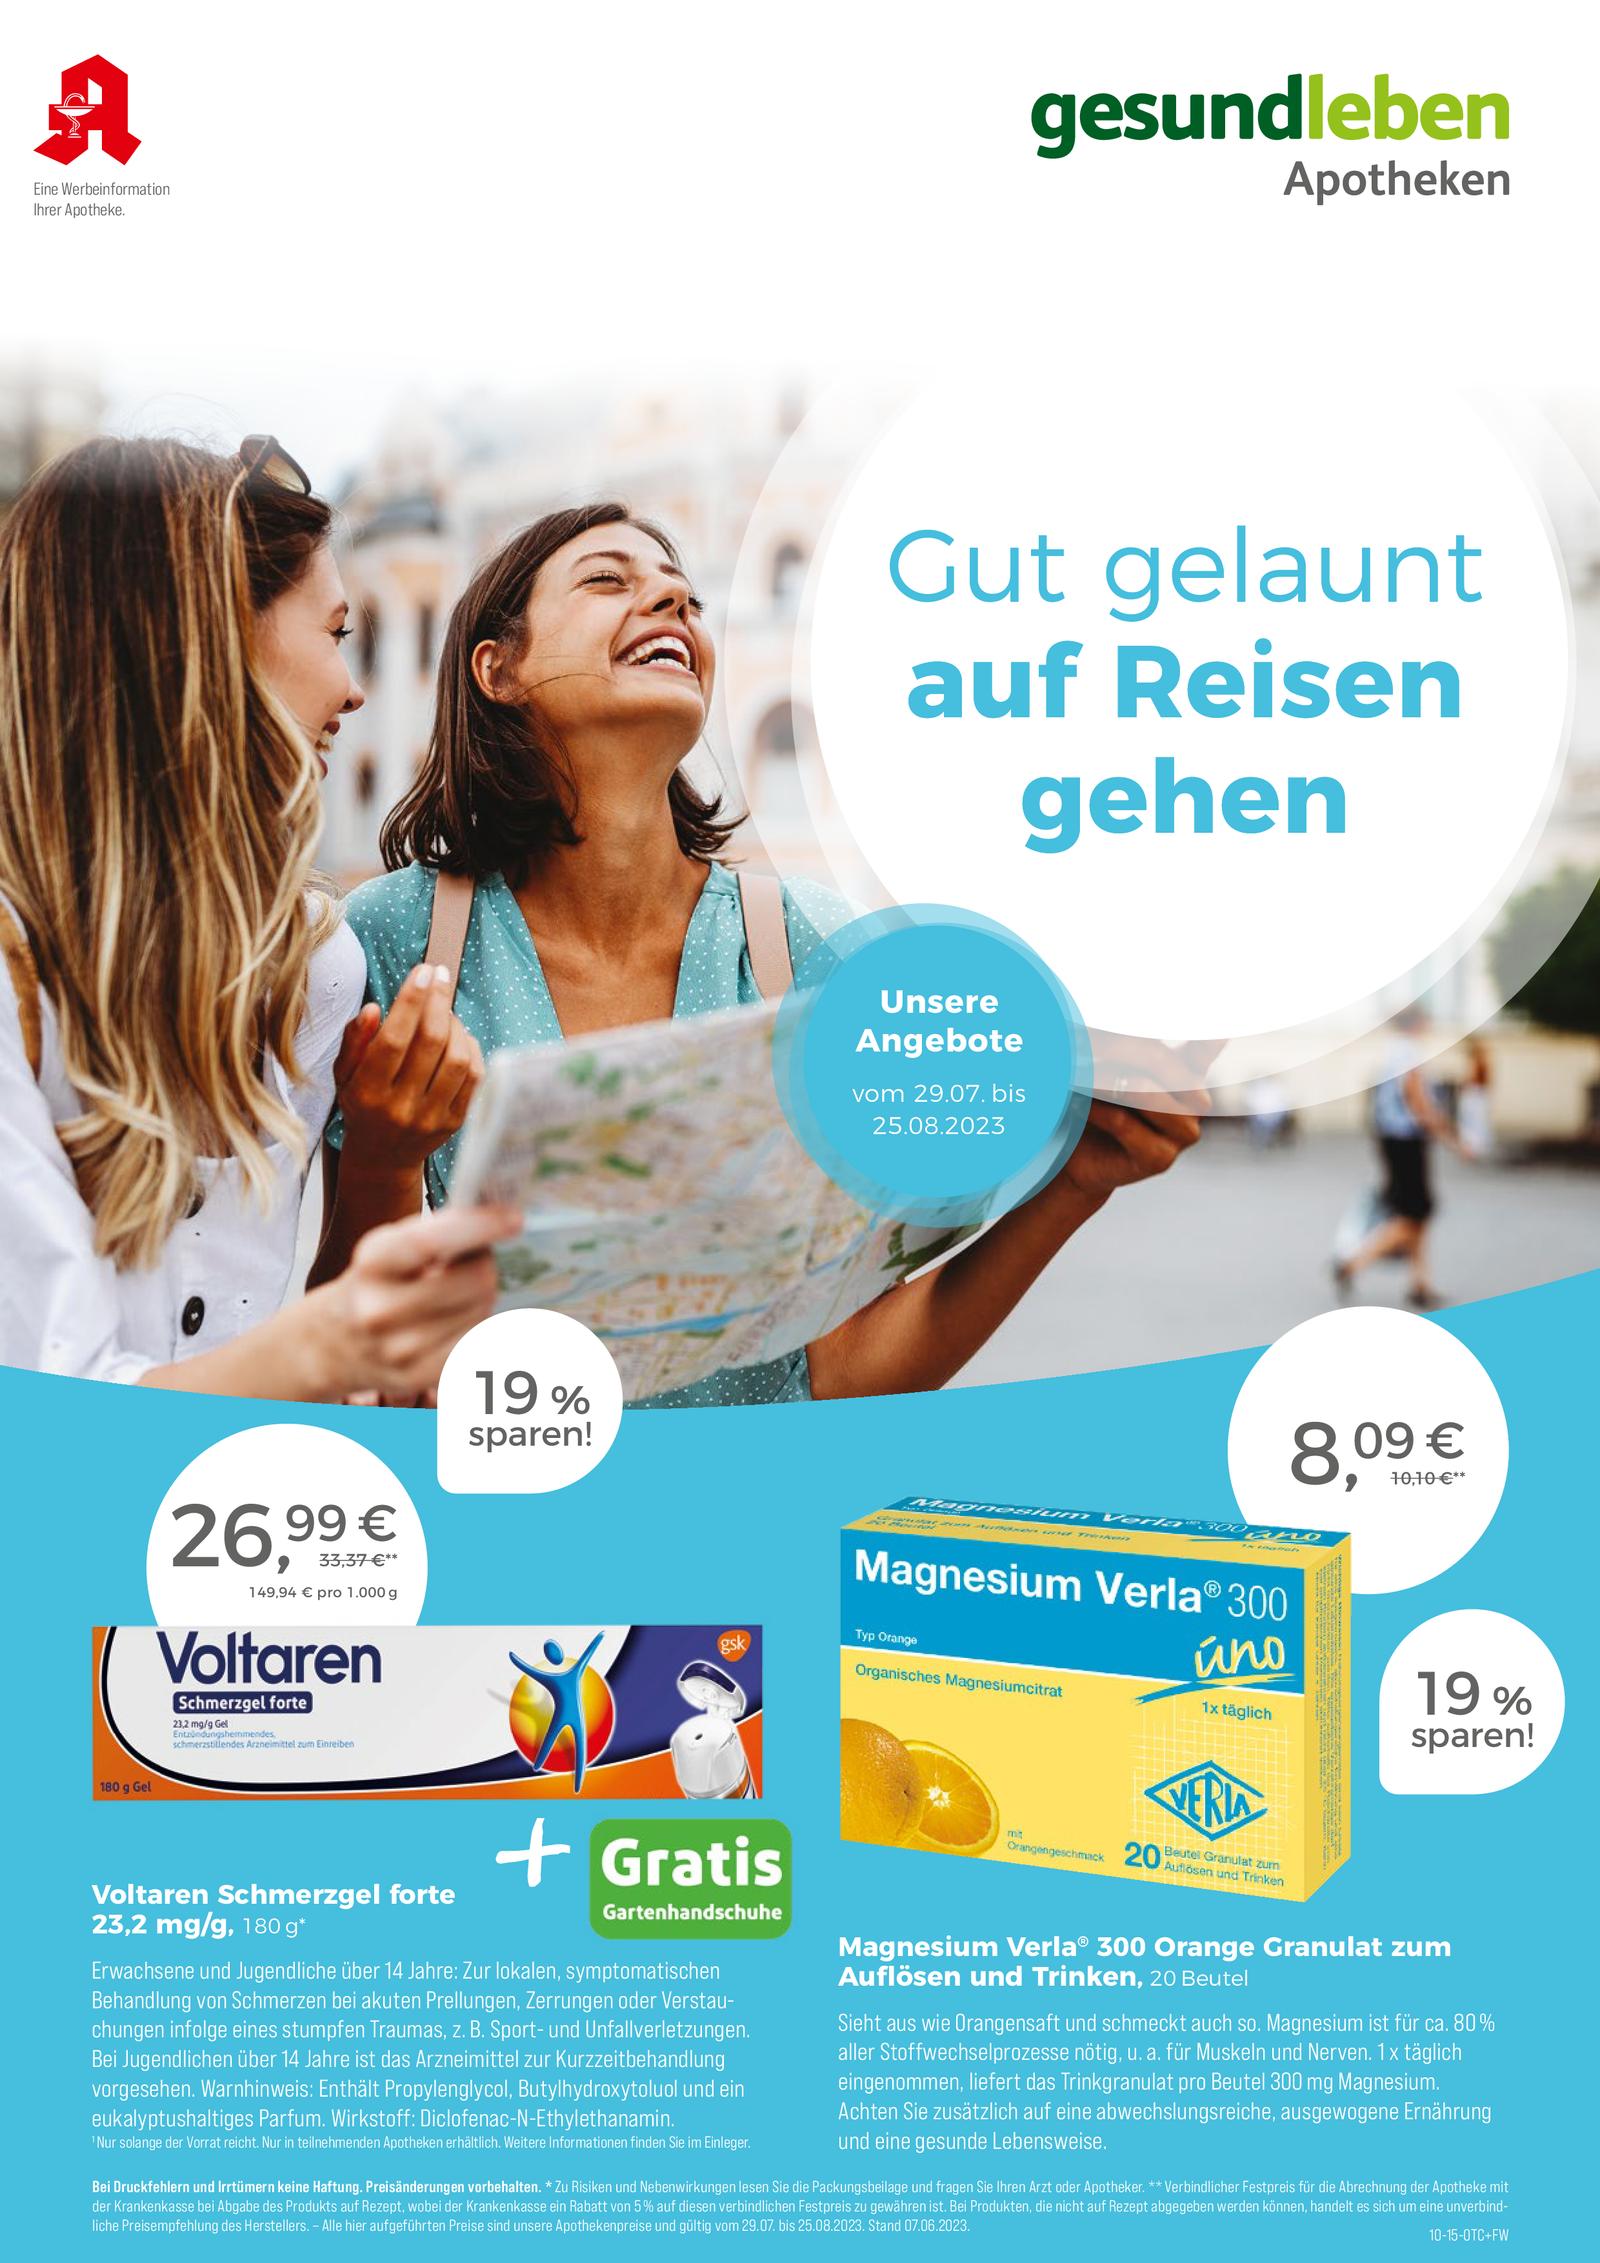 https://mein-uploads.apocdn.net/1036/leaflets/gesundleben_niedrig-Seite1.png